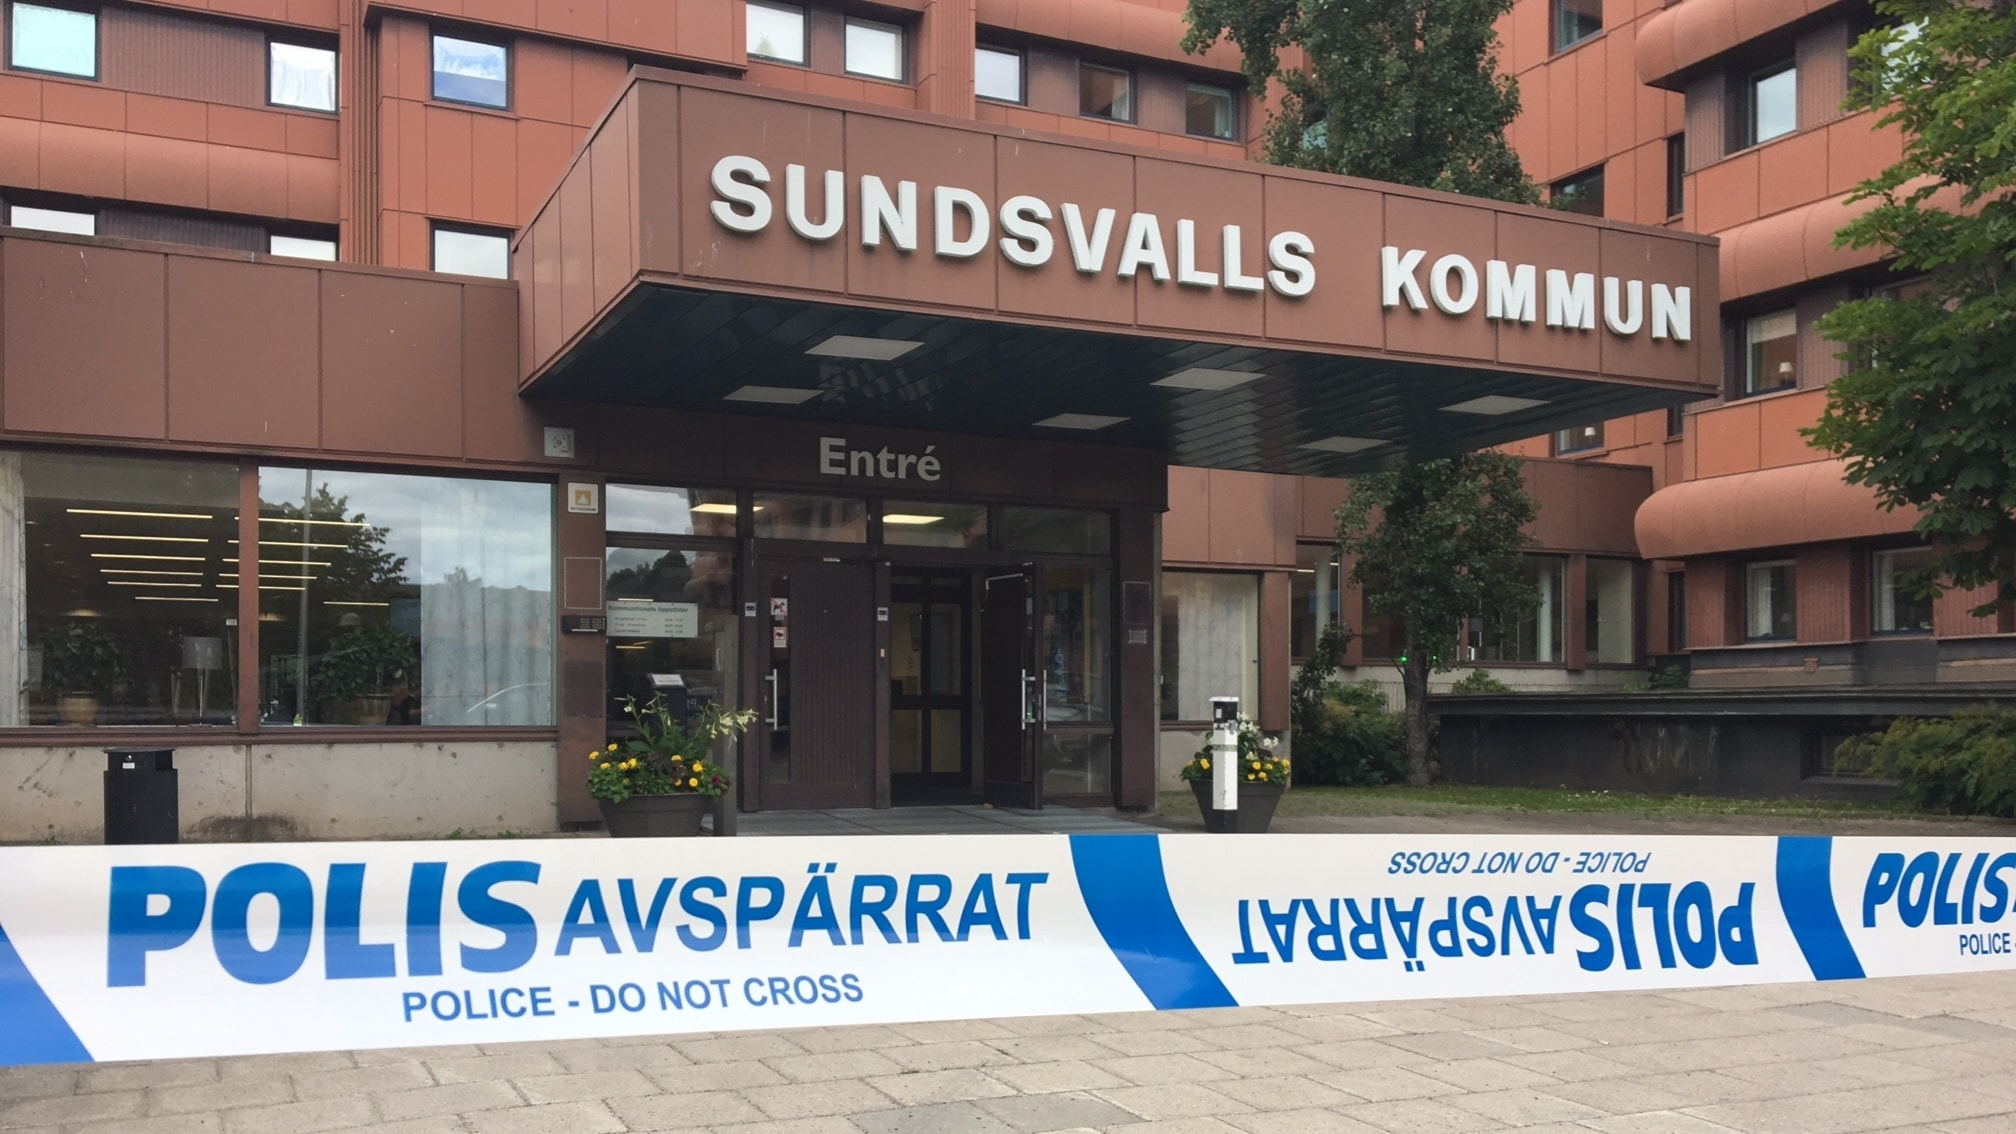 Kommunhuset I Sundsvall Avsparrat P4 Vasternorrland